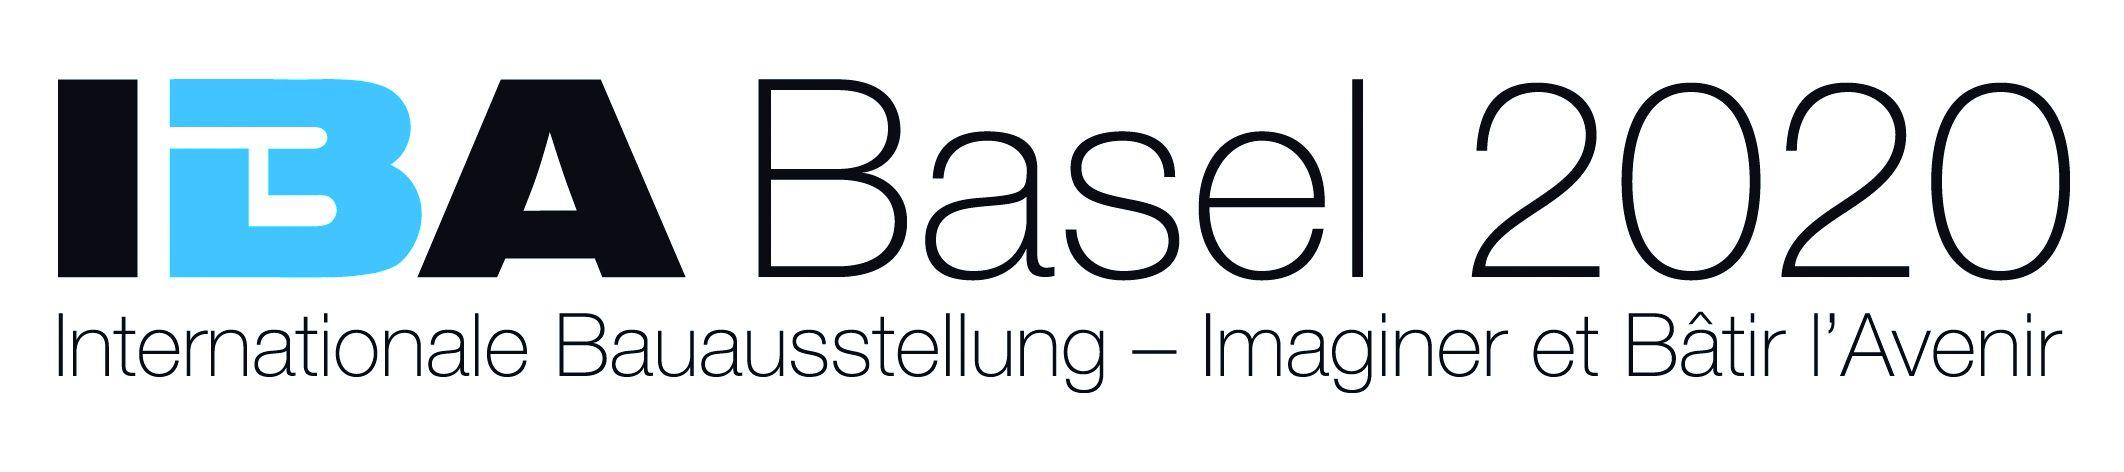 Internationale Bauaustellung IBA basel 2020